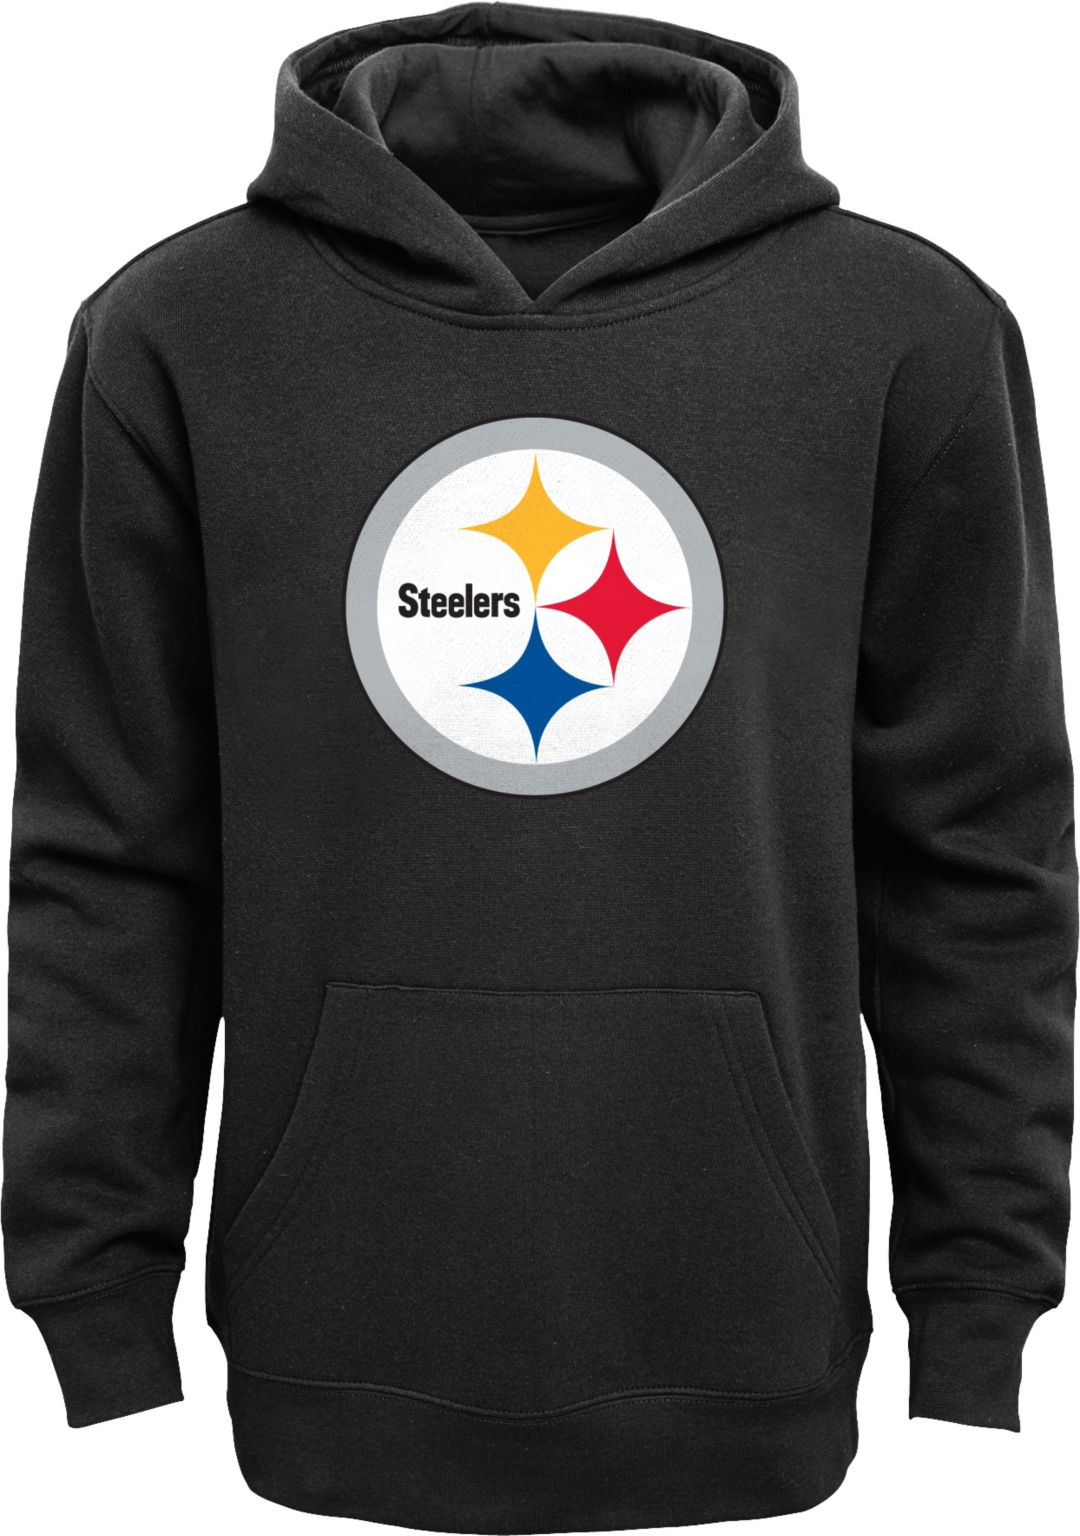 reputable site e3b54 1b9d5 NFL Team Apparel Youth Pittsburgh Steelers Logo Black Hoodie